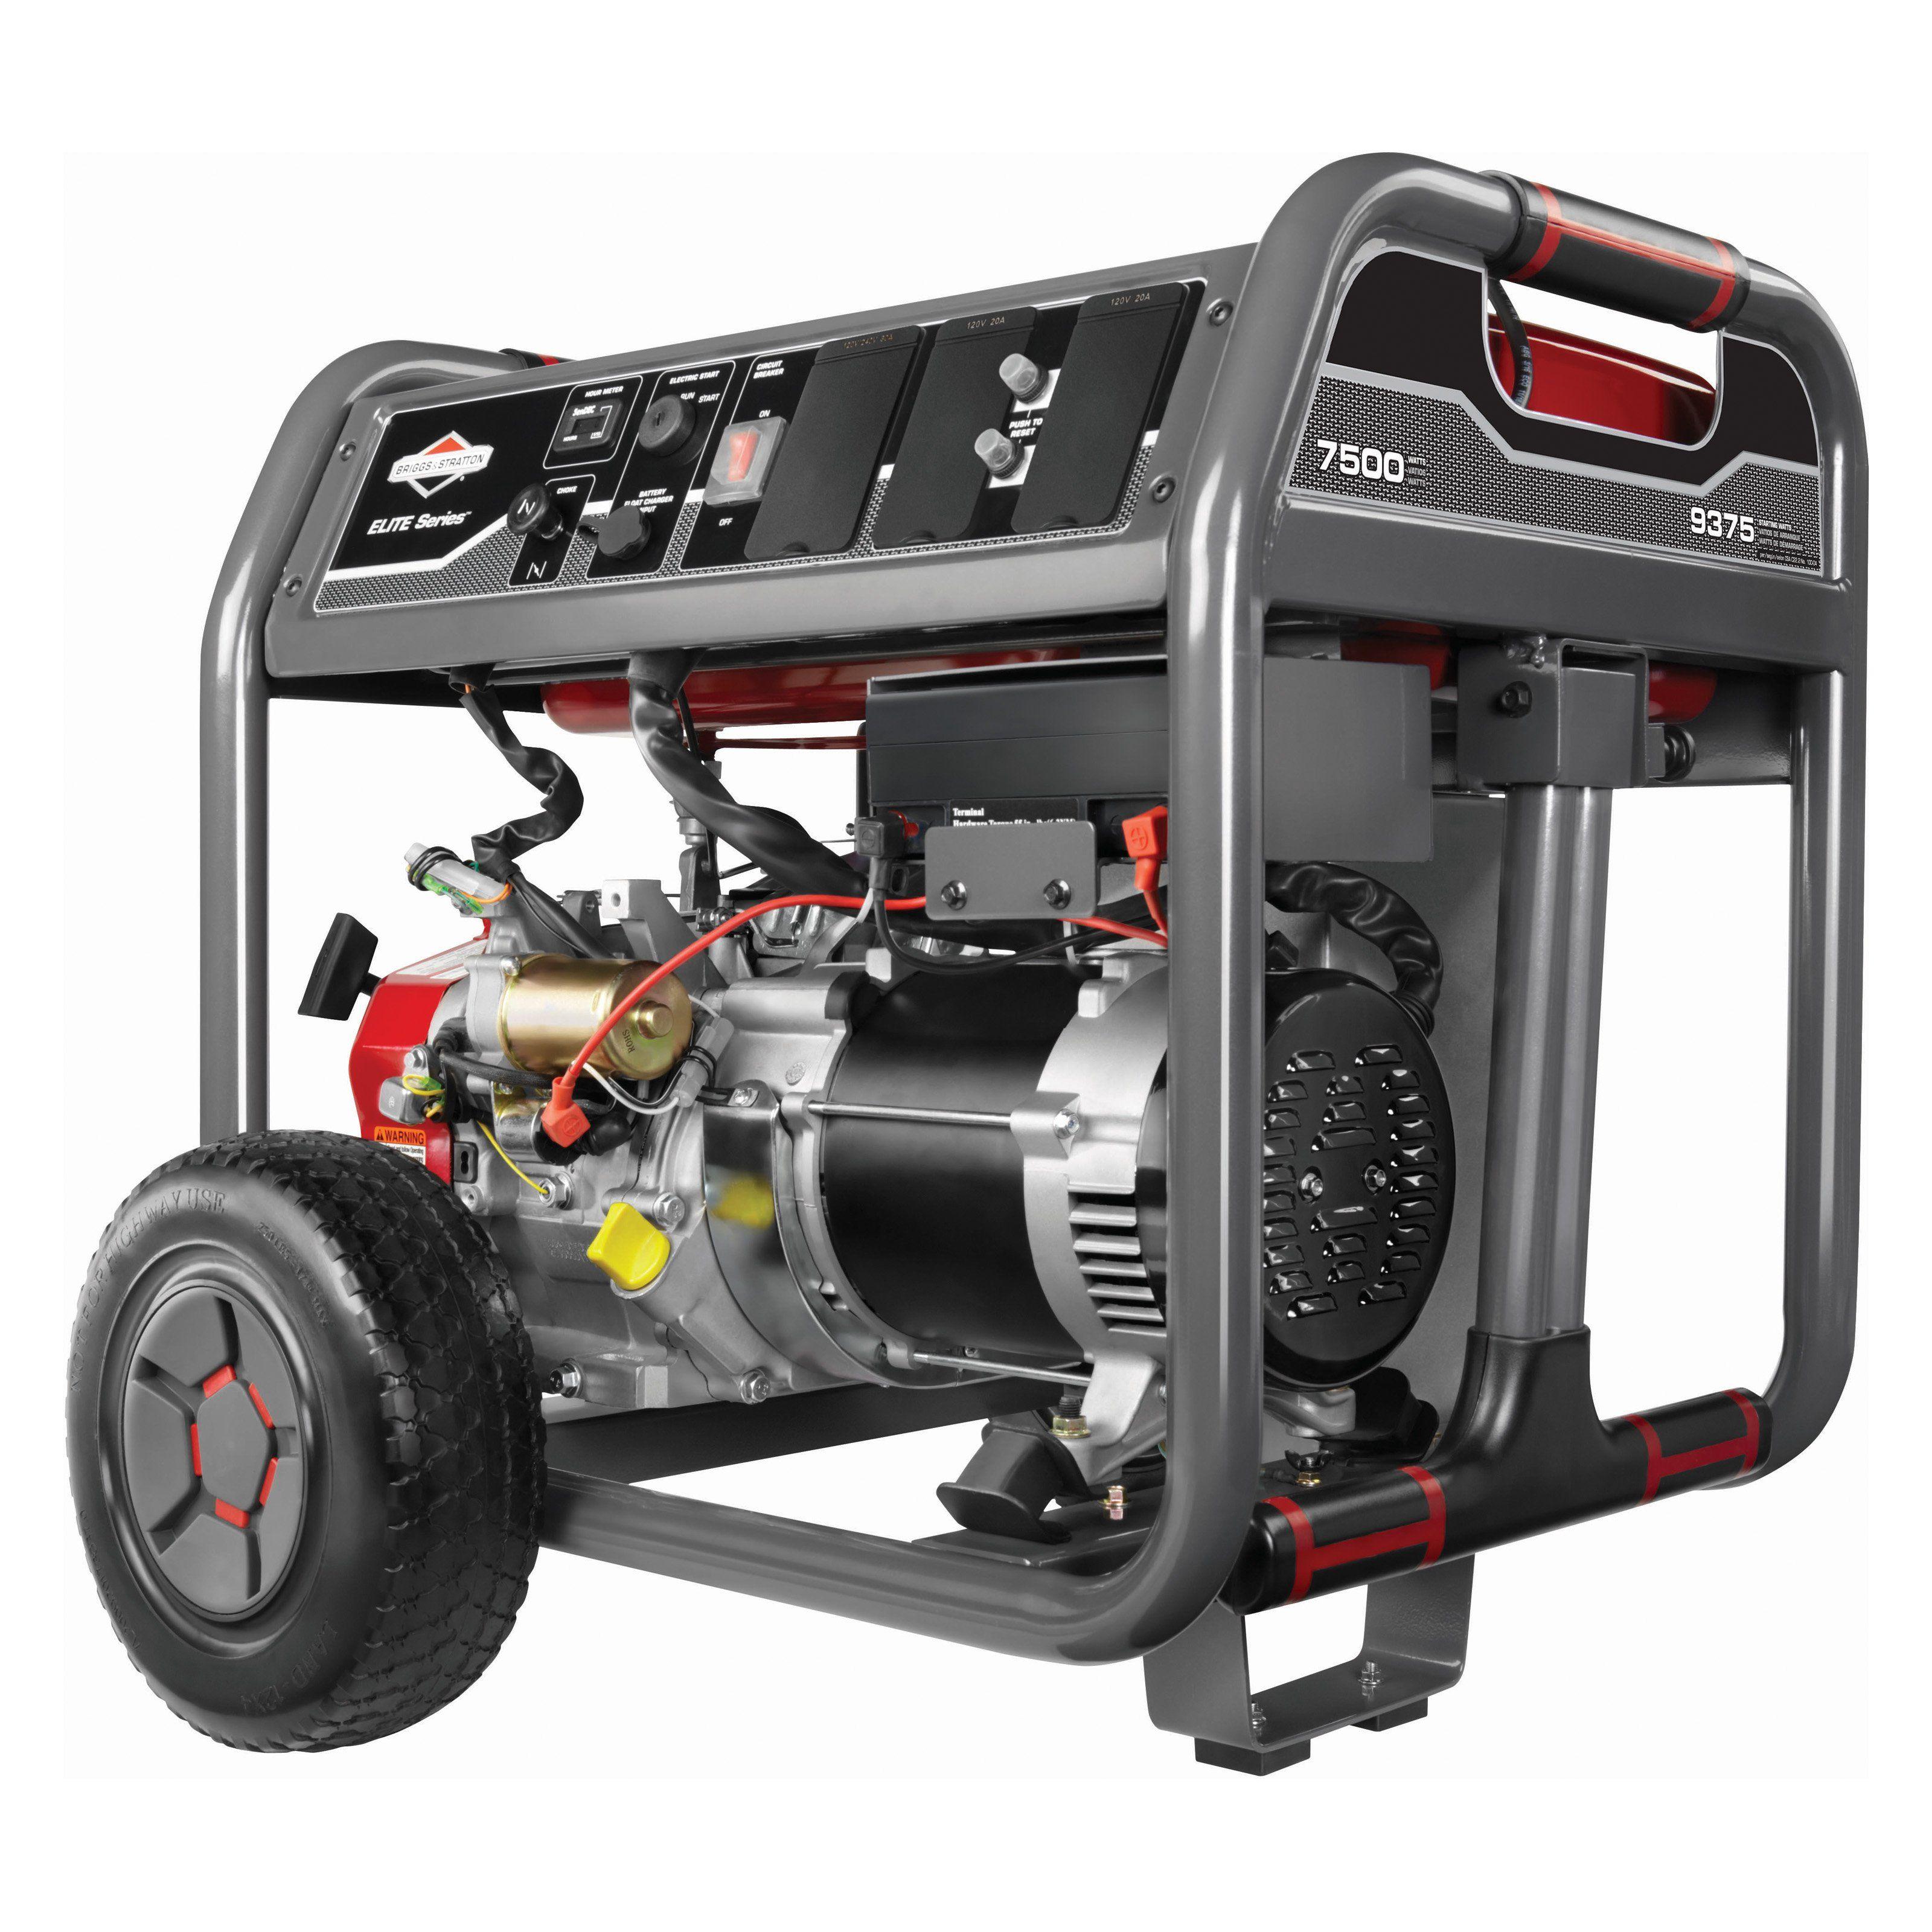 Briggs & Stratton Elite Series 7500 Watt Gas Powered Portable